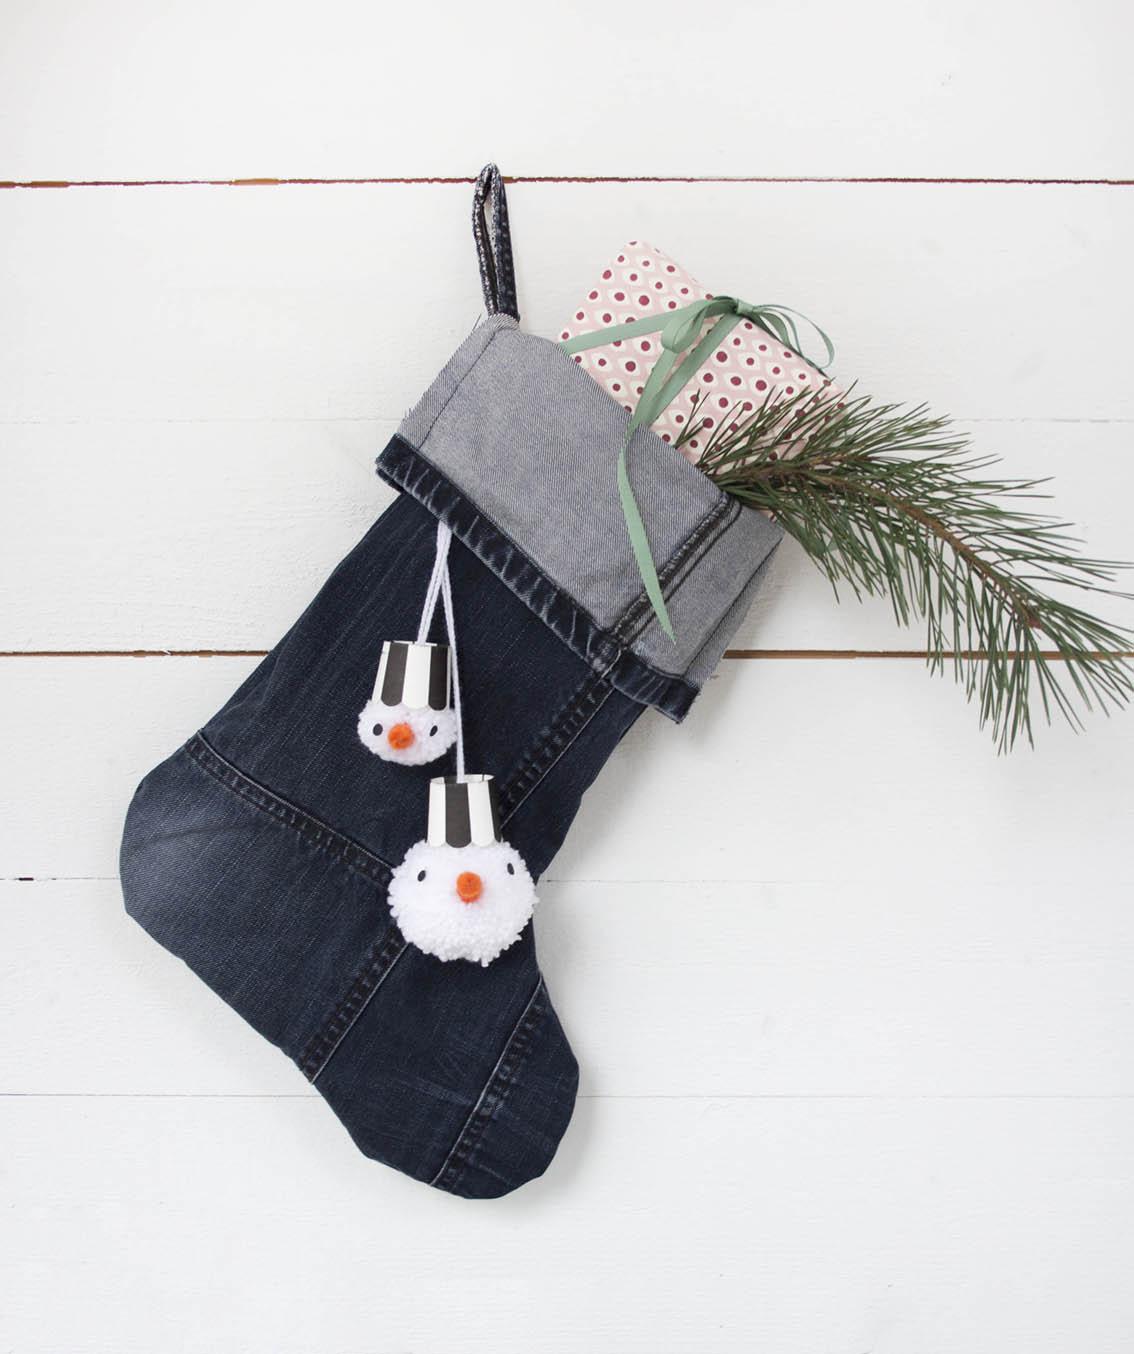 Julstrumpa i jeans | Pysselbolaget